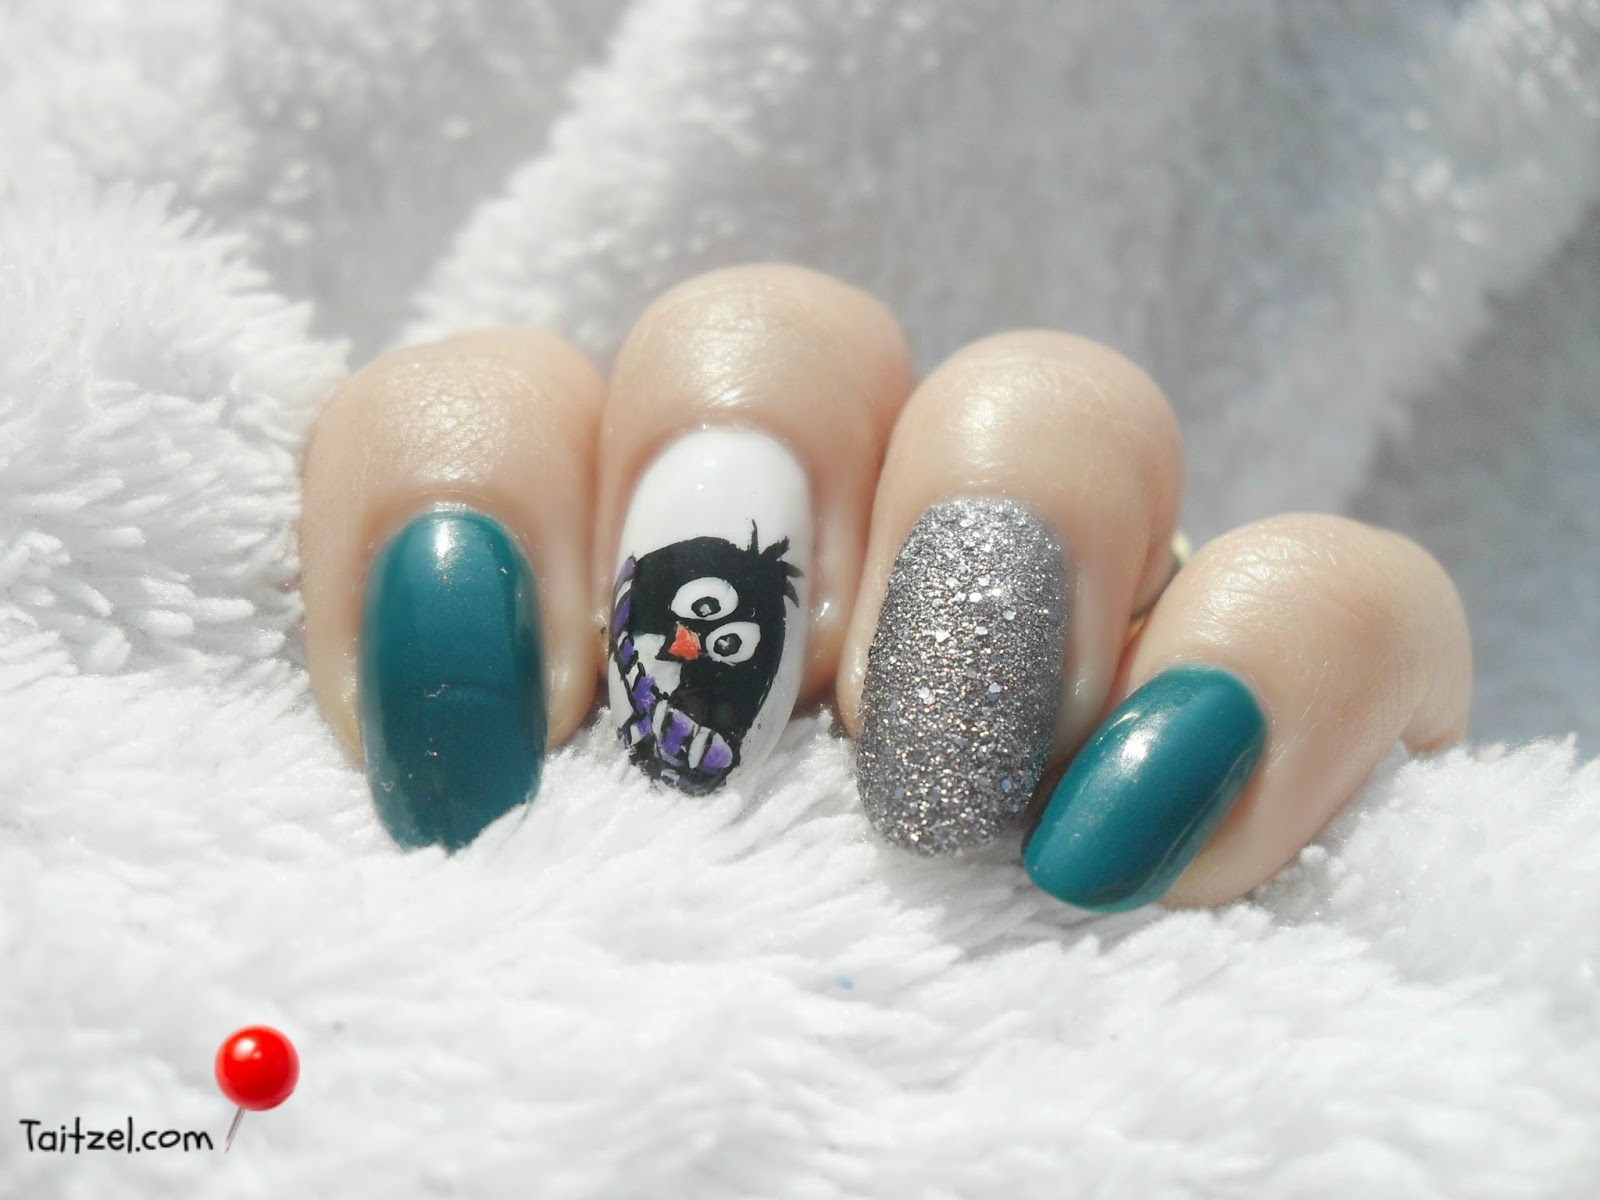 Model de unghii pentru craciun cu pinguin de iarna christmas nail art taitzel beauty - Modele nail art ...